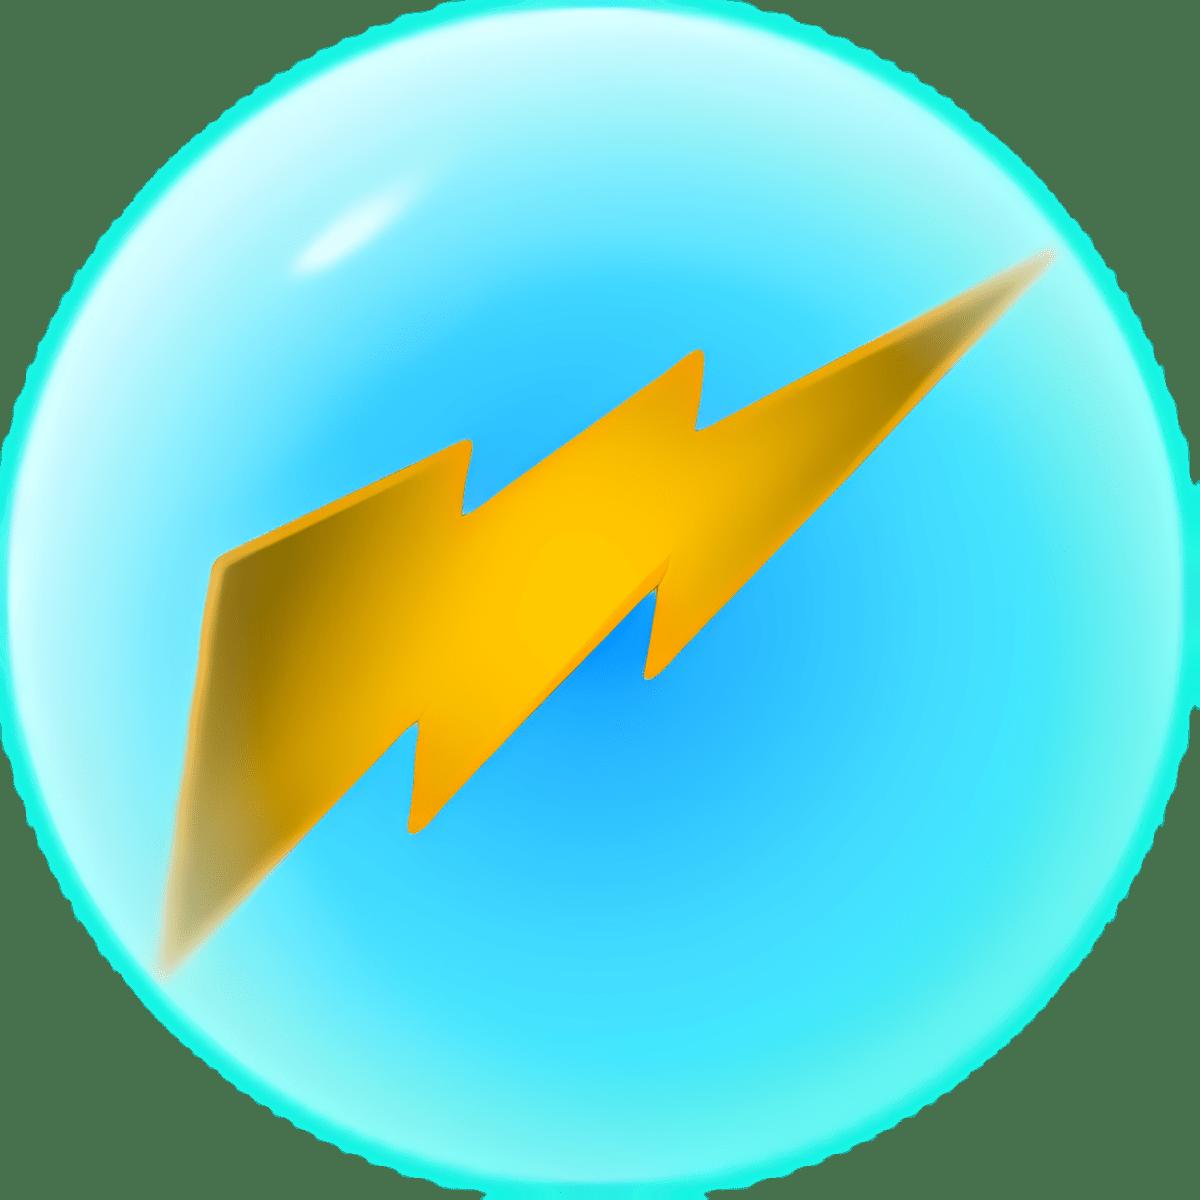 Voicer - Voice Changer 3.0 y versiones superiores